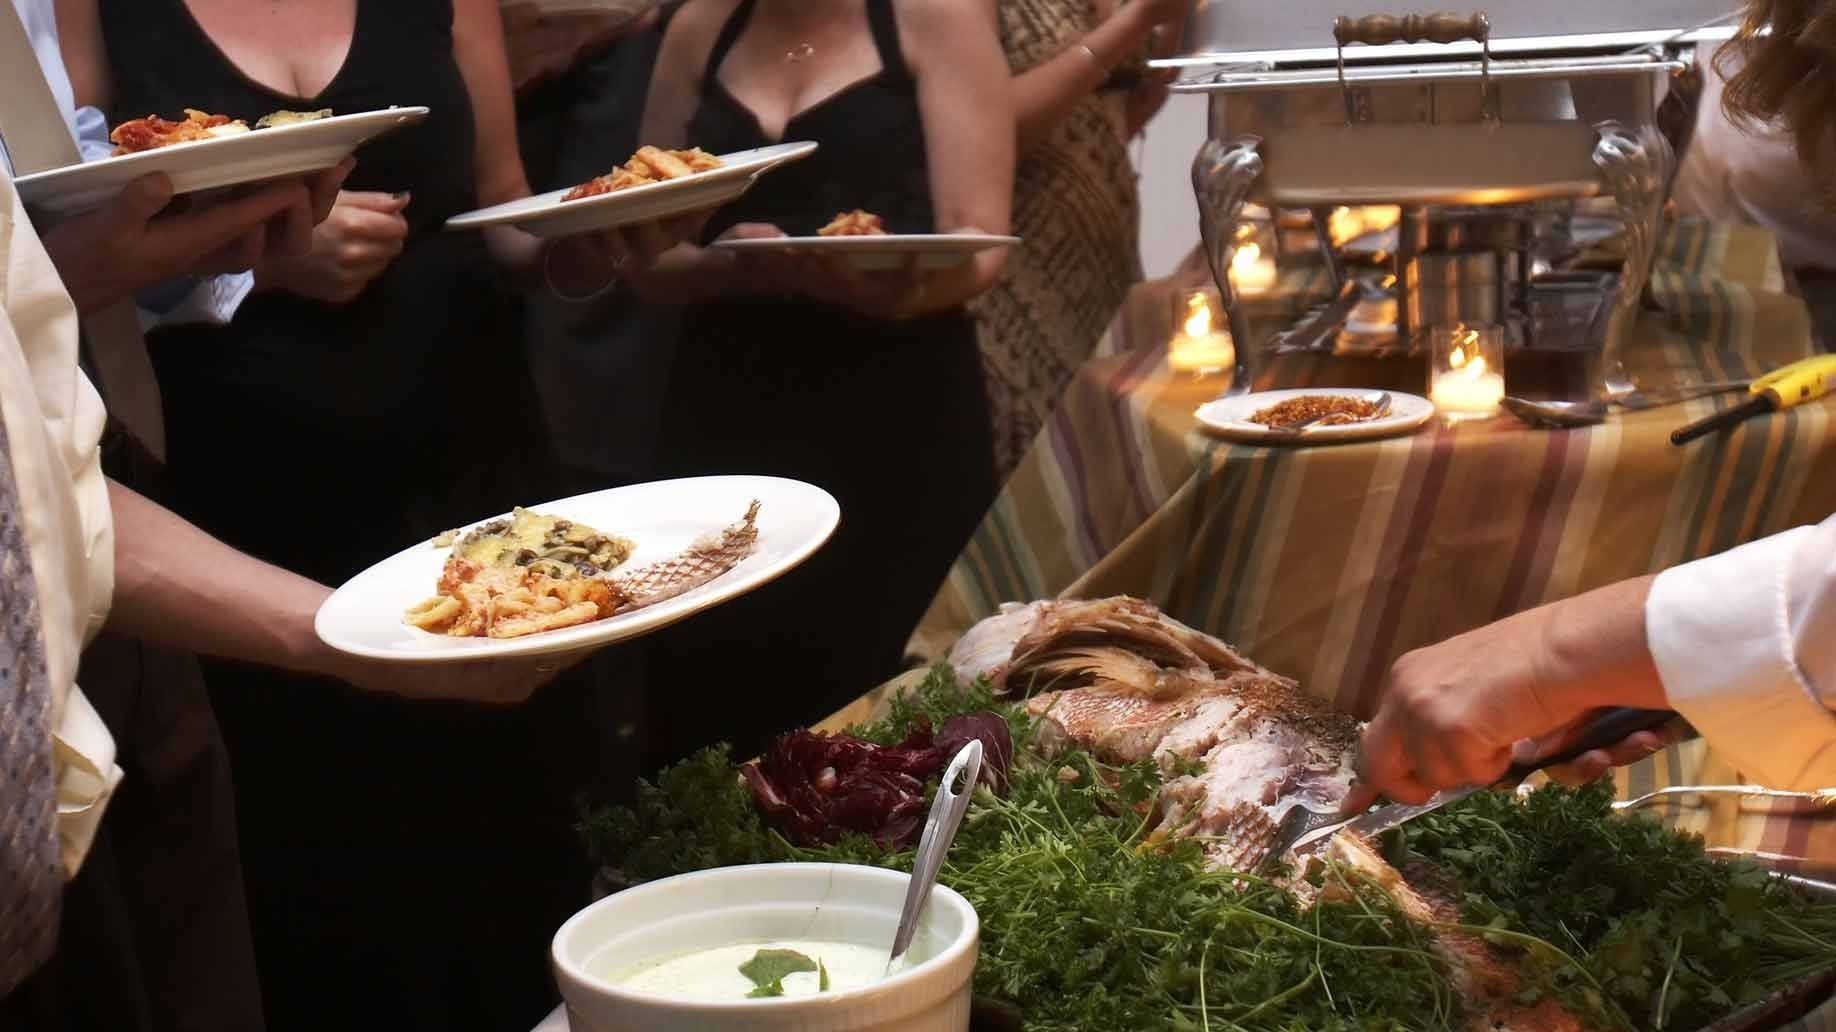 10 Attractive Cheap Wedding Reception Food Ideas 23 cheap wedding reception food drink menu ideas on a budget 10 2021